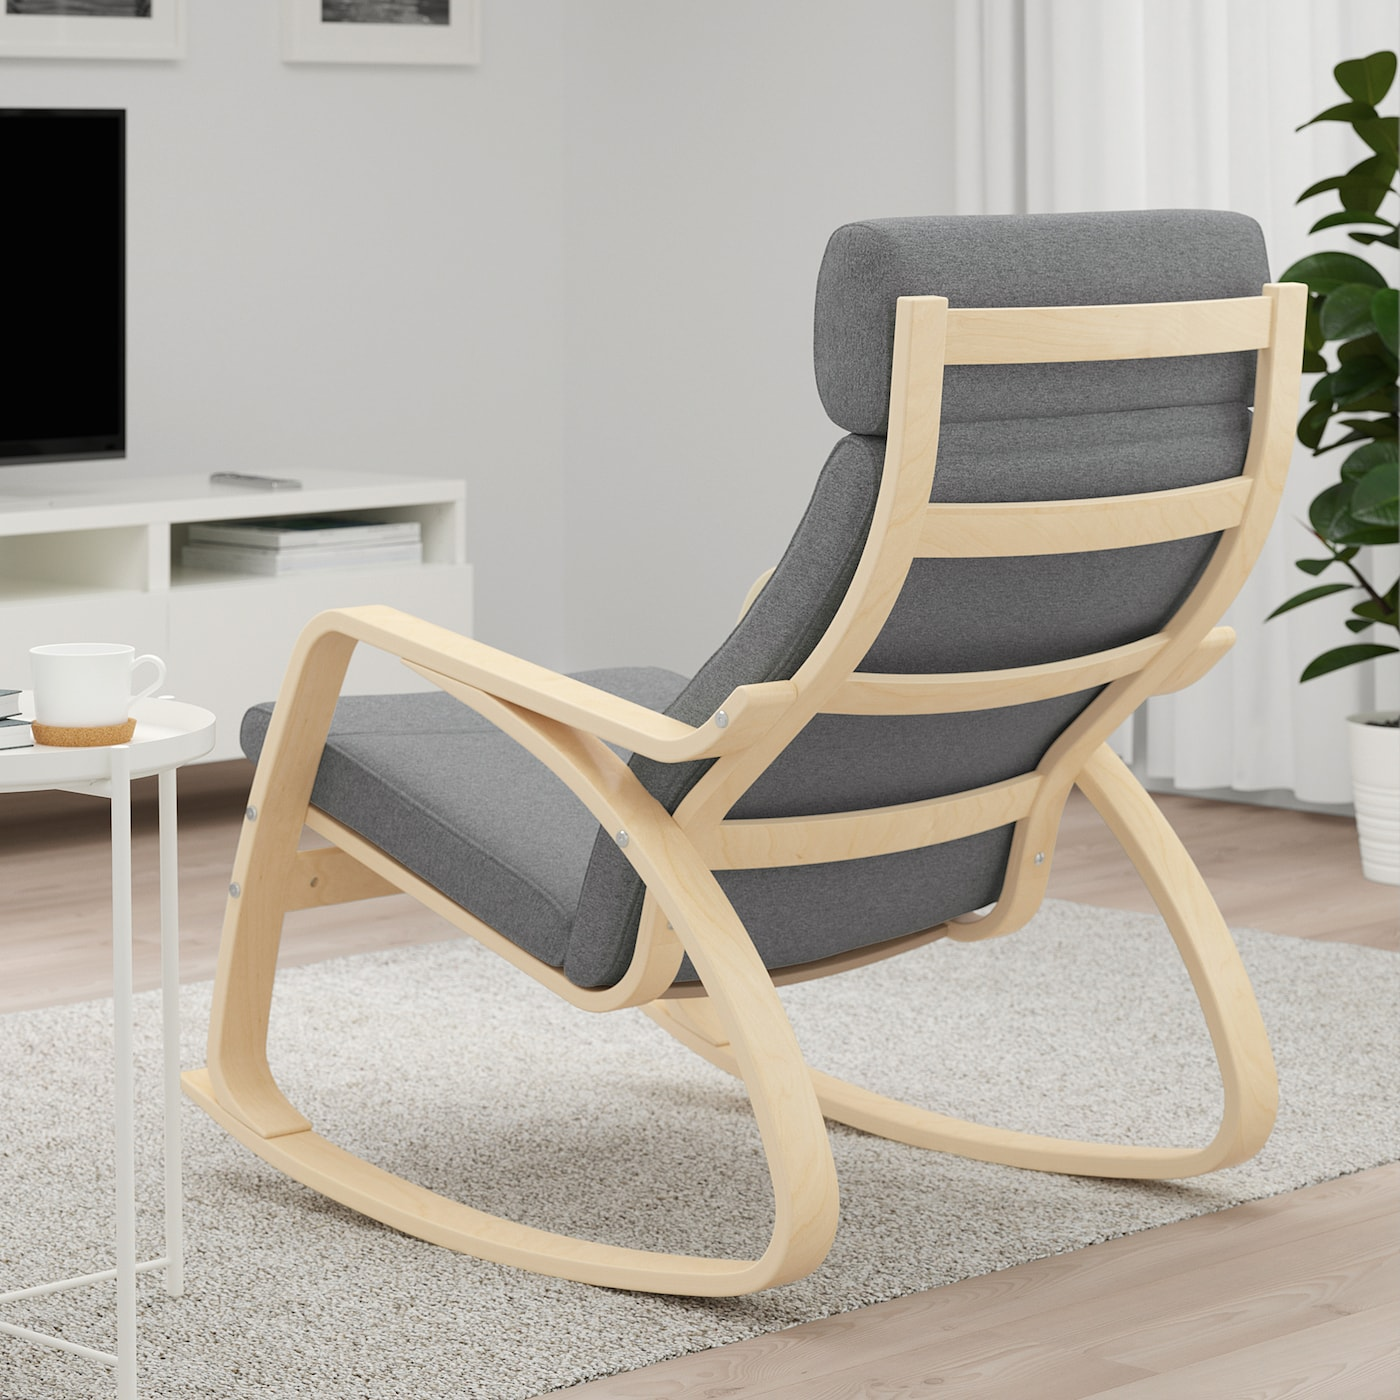 Buy Poang Rocking Chair Online Qatar Ikea